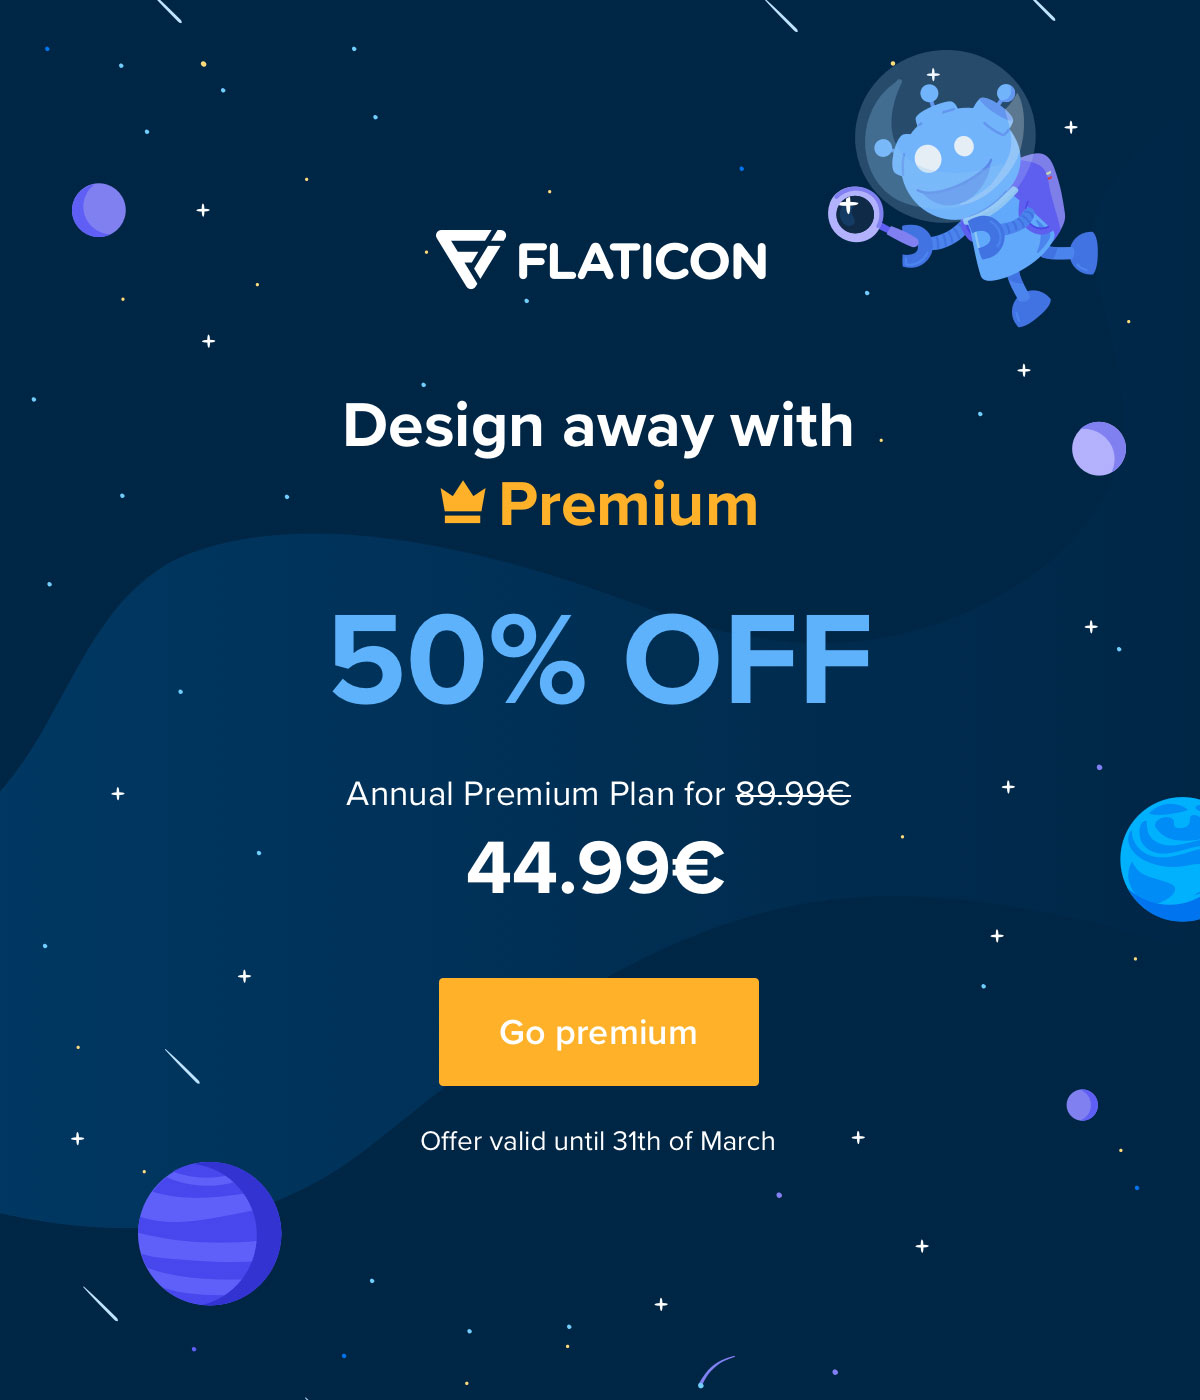 Design away with Premium